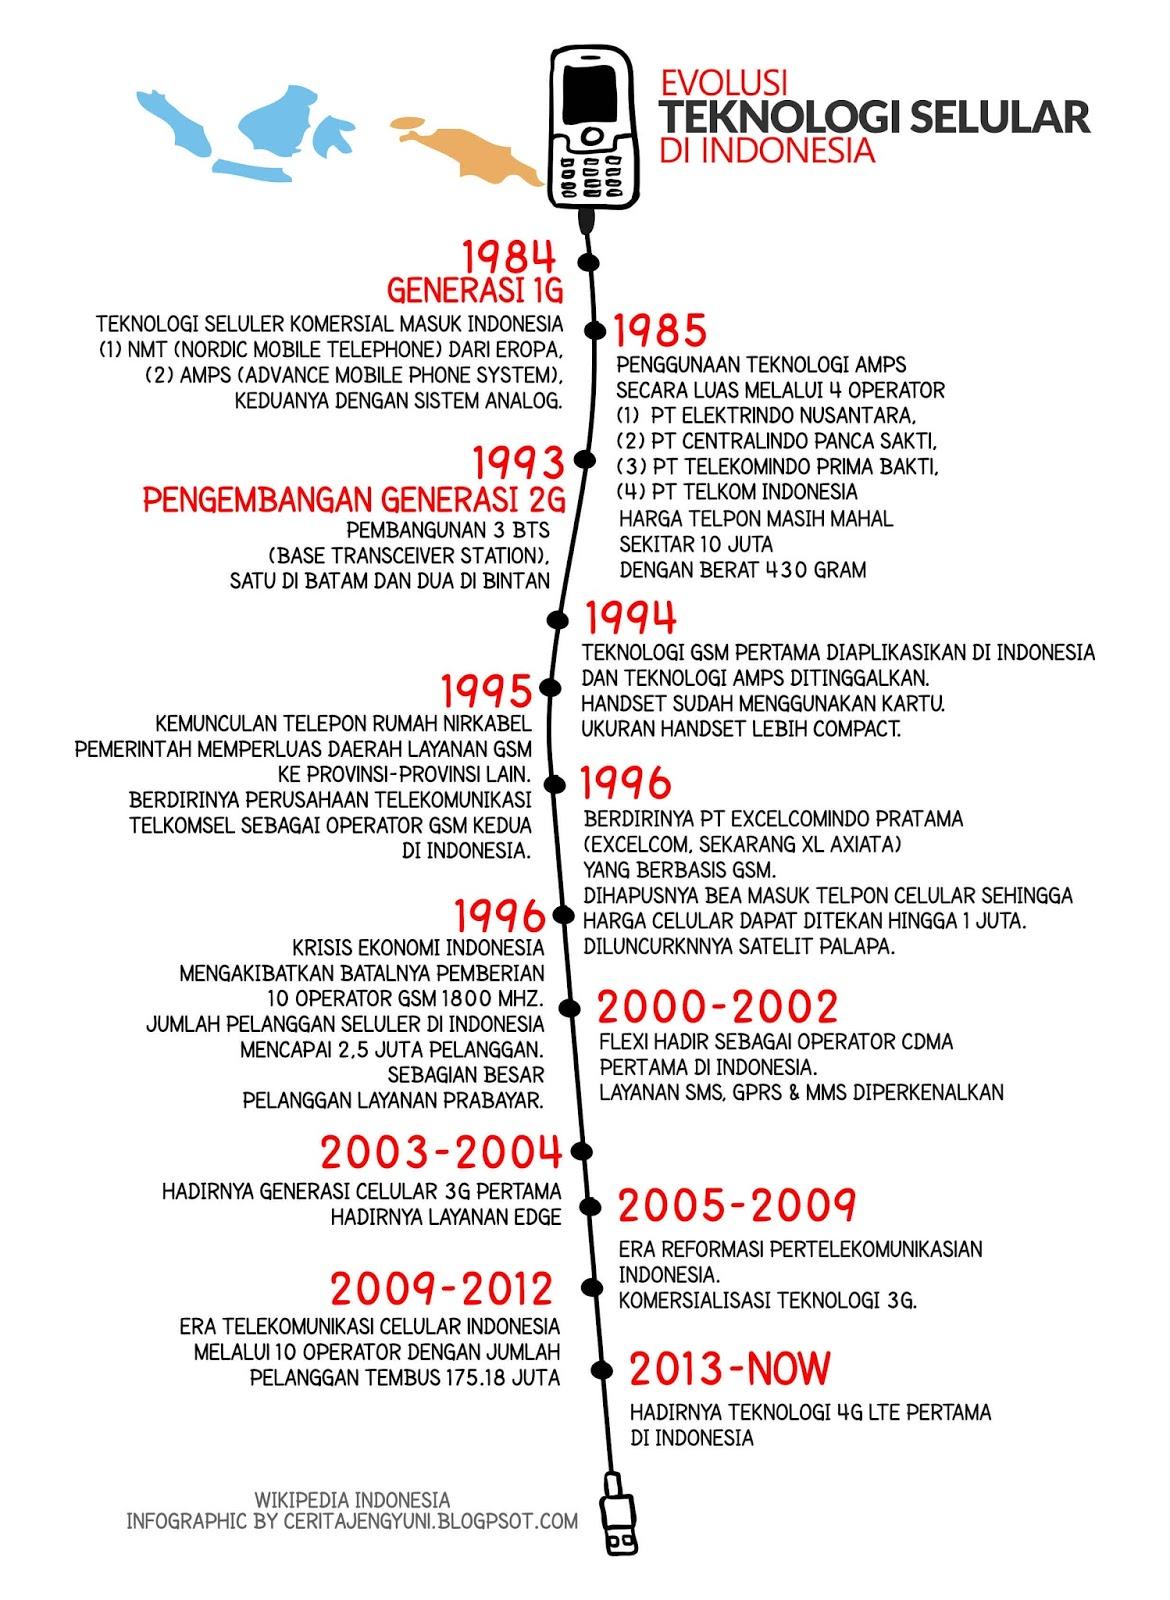 Evolusi teknologi Celular di Indonesia